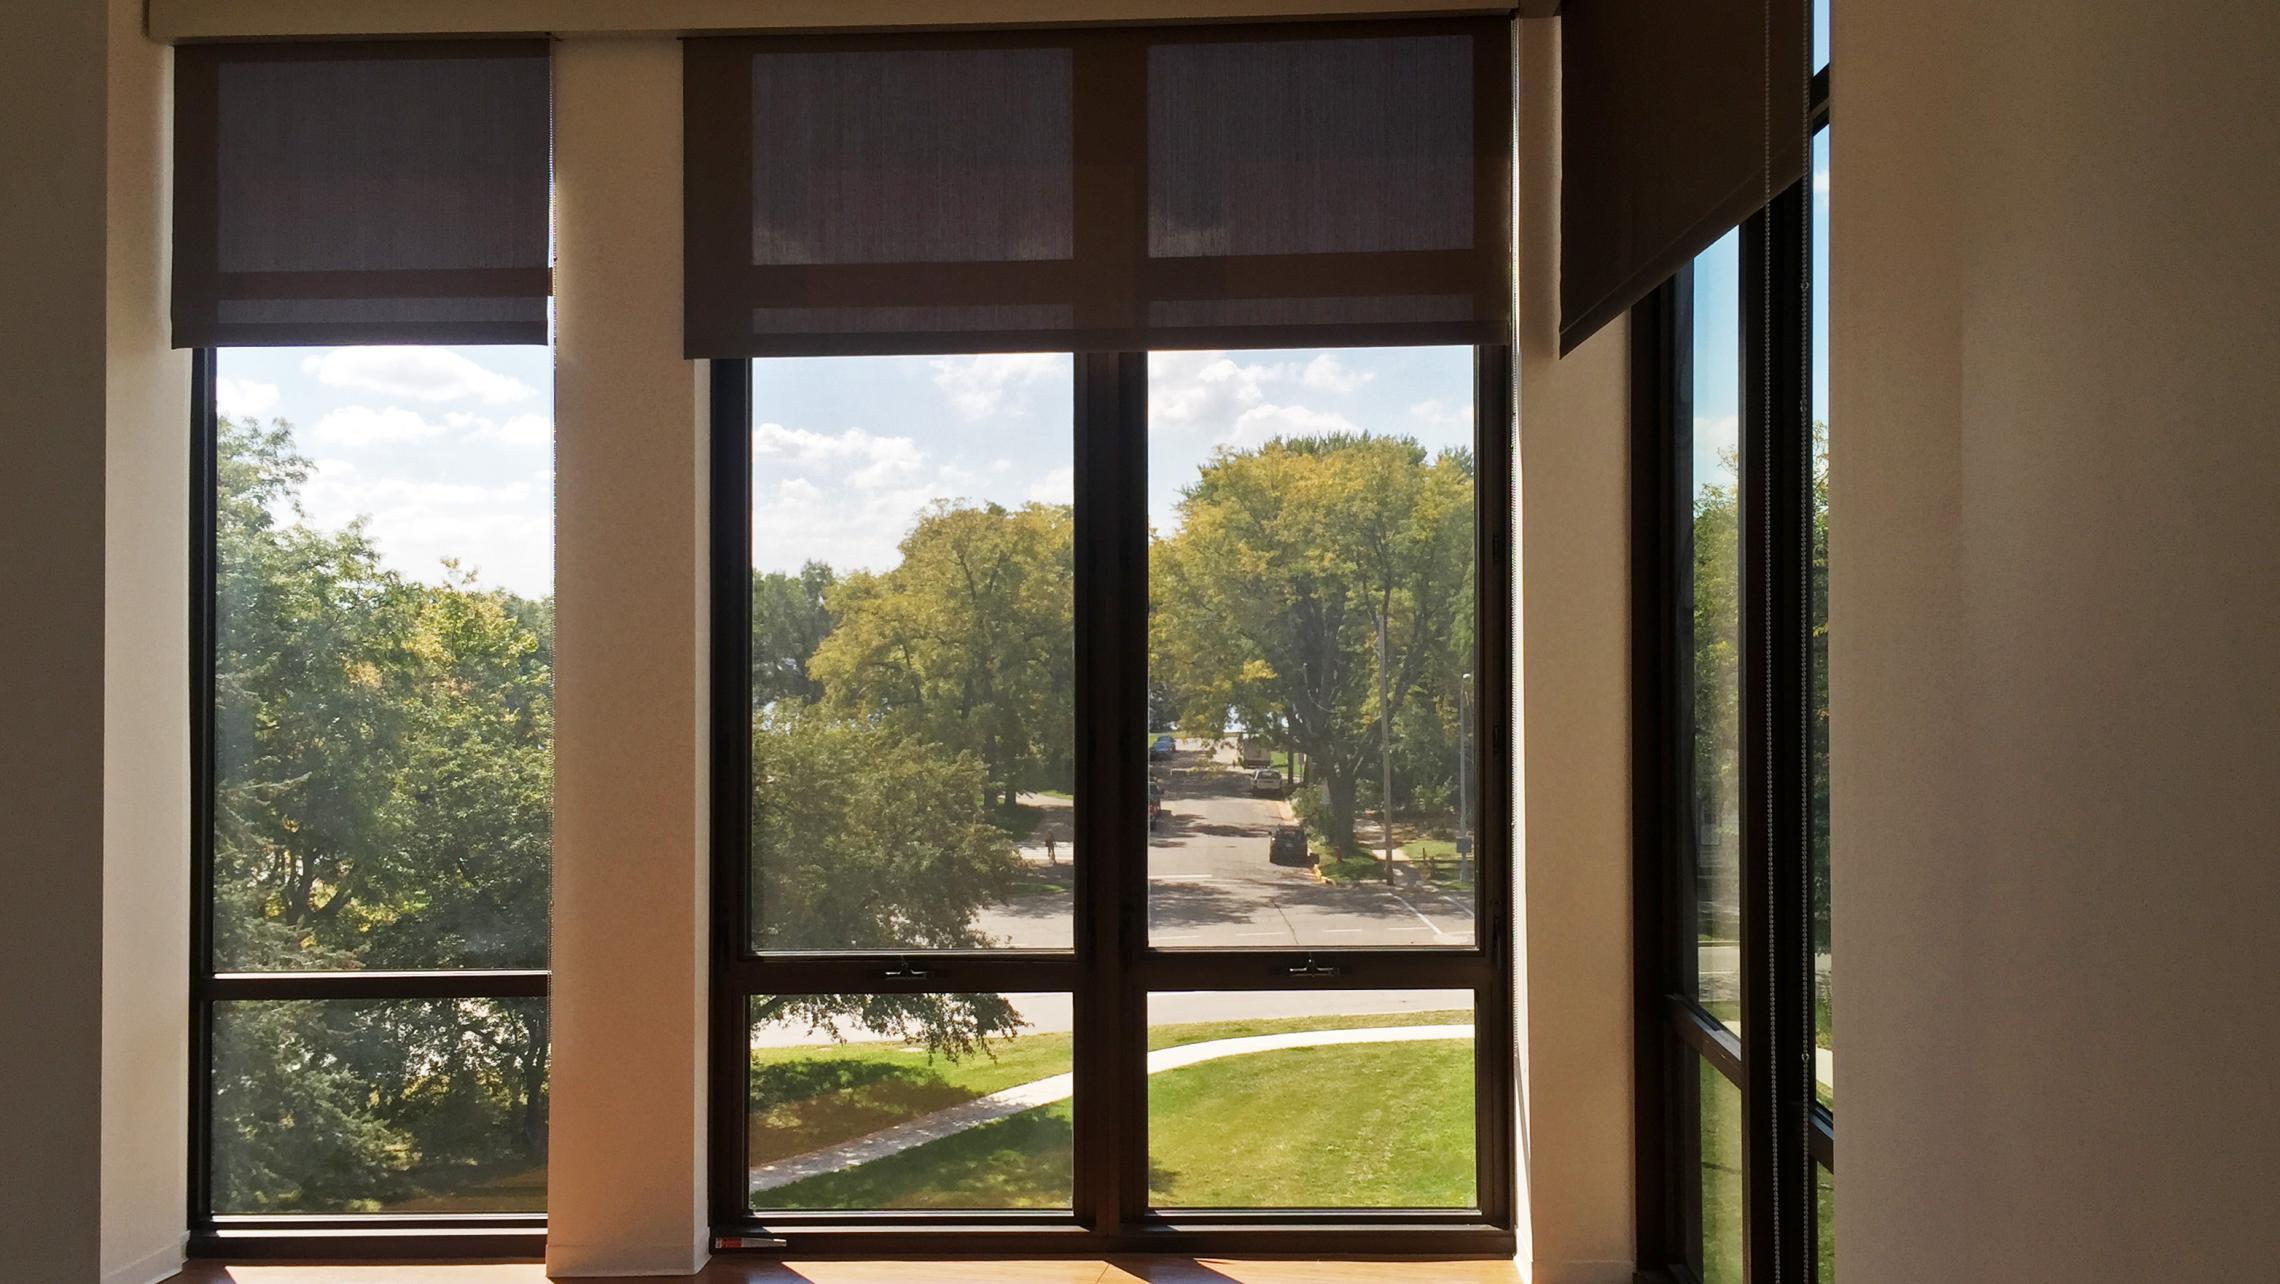 ULI Seven27 Apartment 339 - Living Room with Neighborhood View